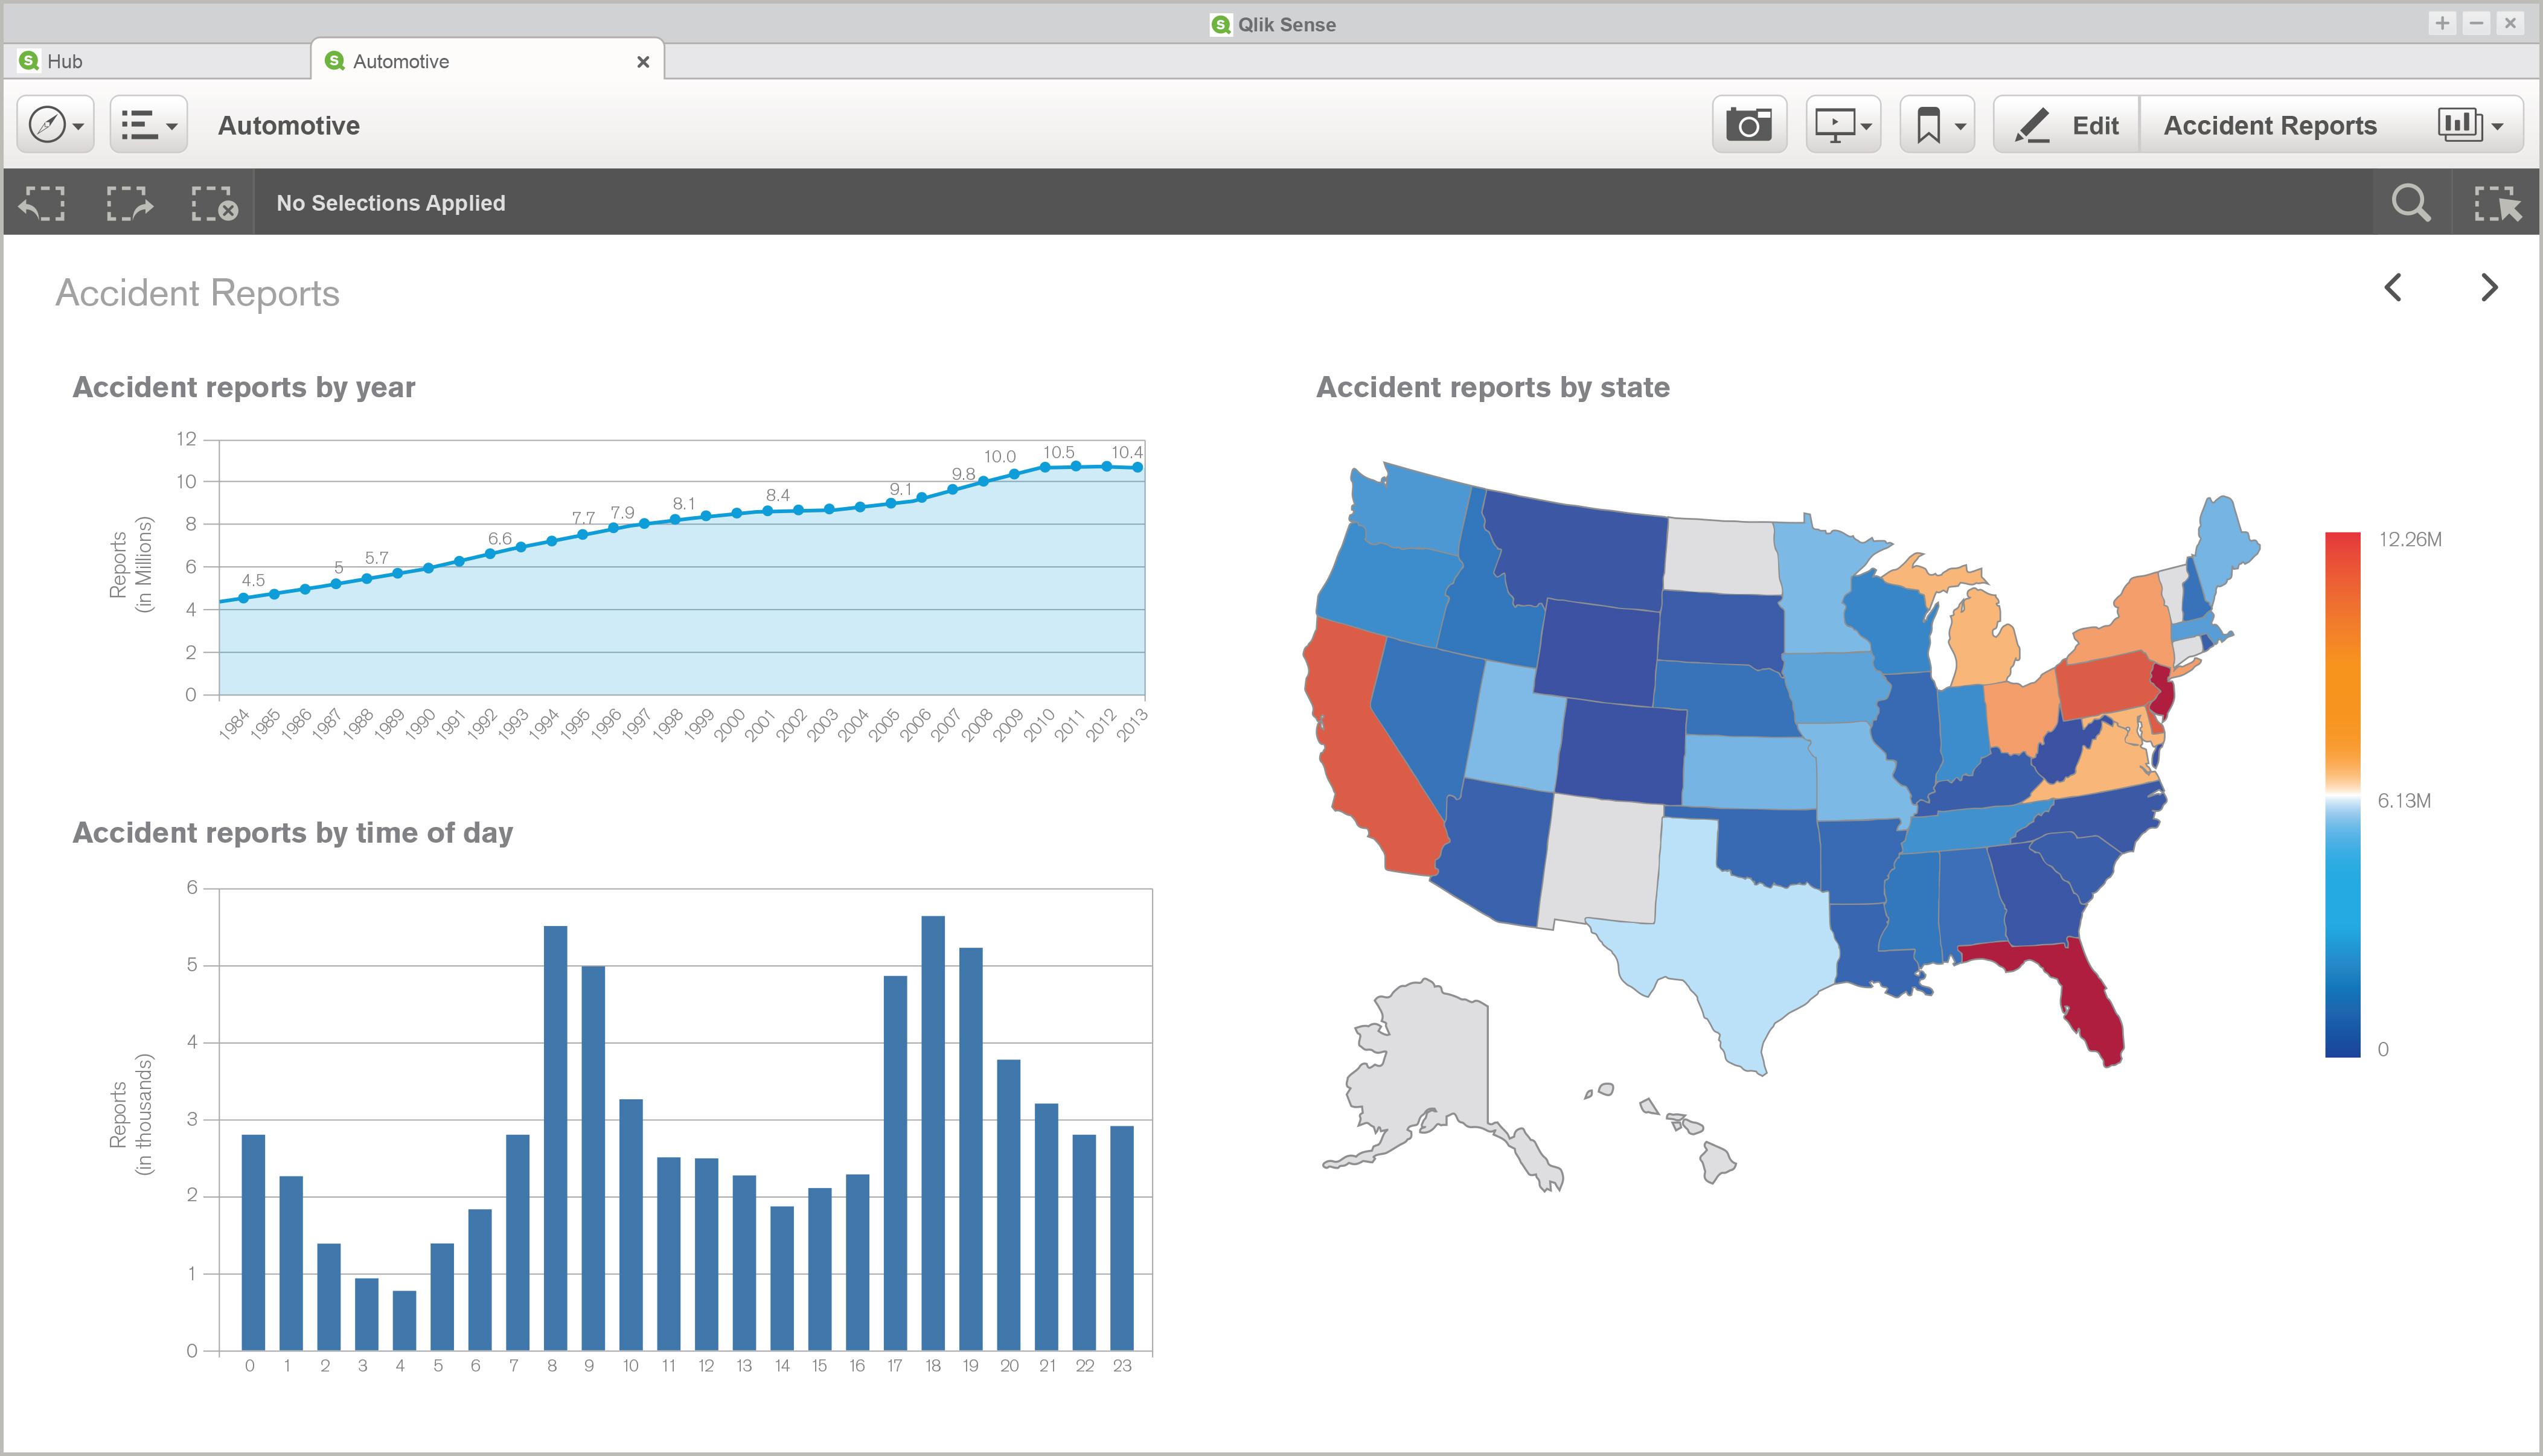 Qlik Sense mapping and graphing capabilities